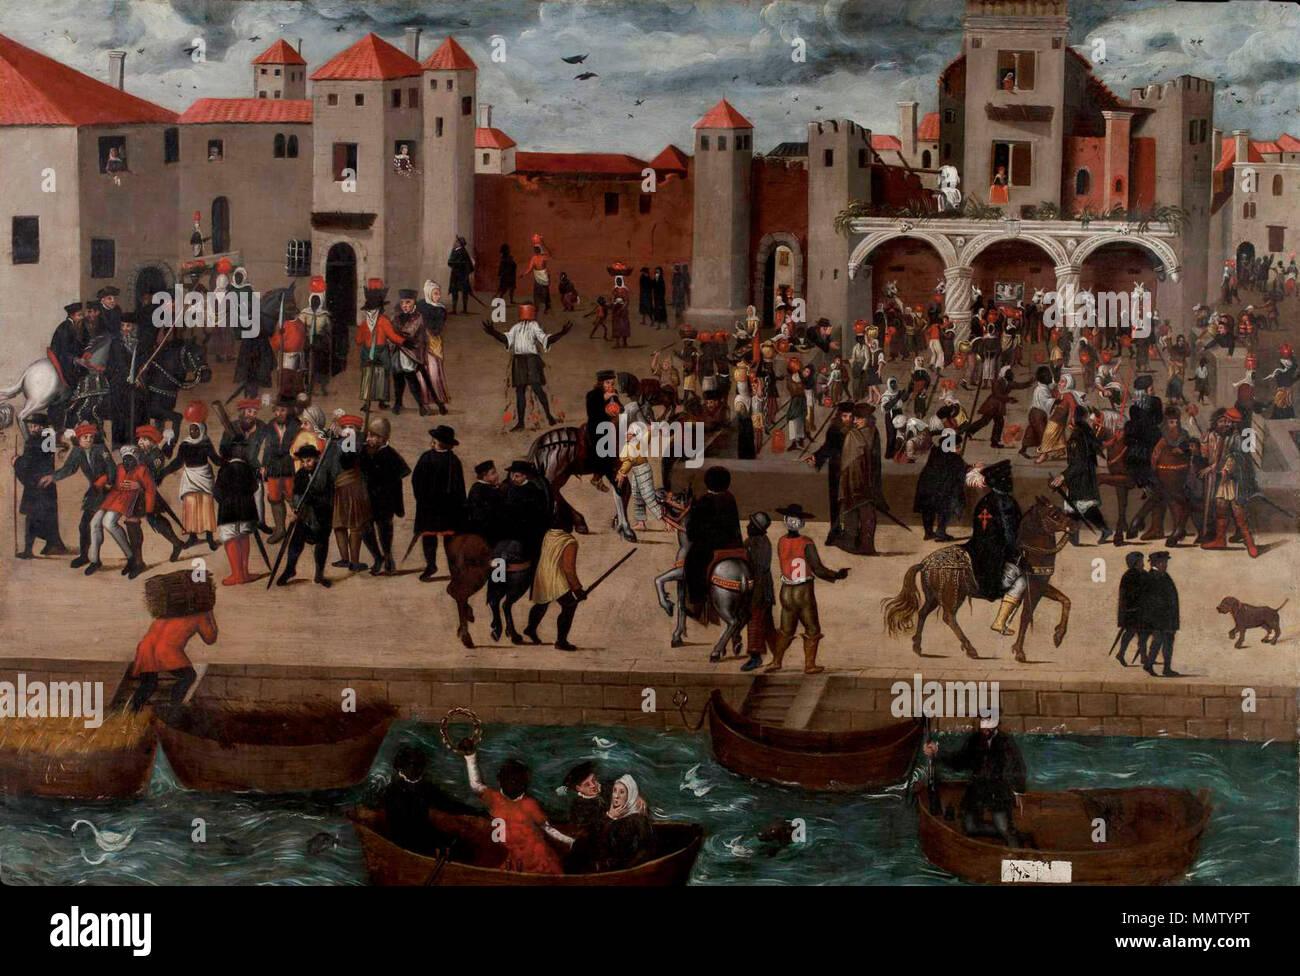 Chafariz d'El-Rey, c. 1570-80 (Colecção Berardo)